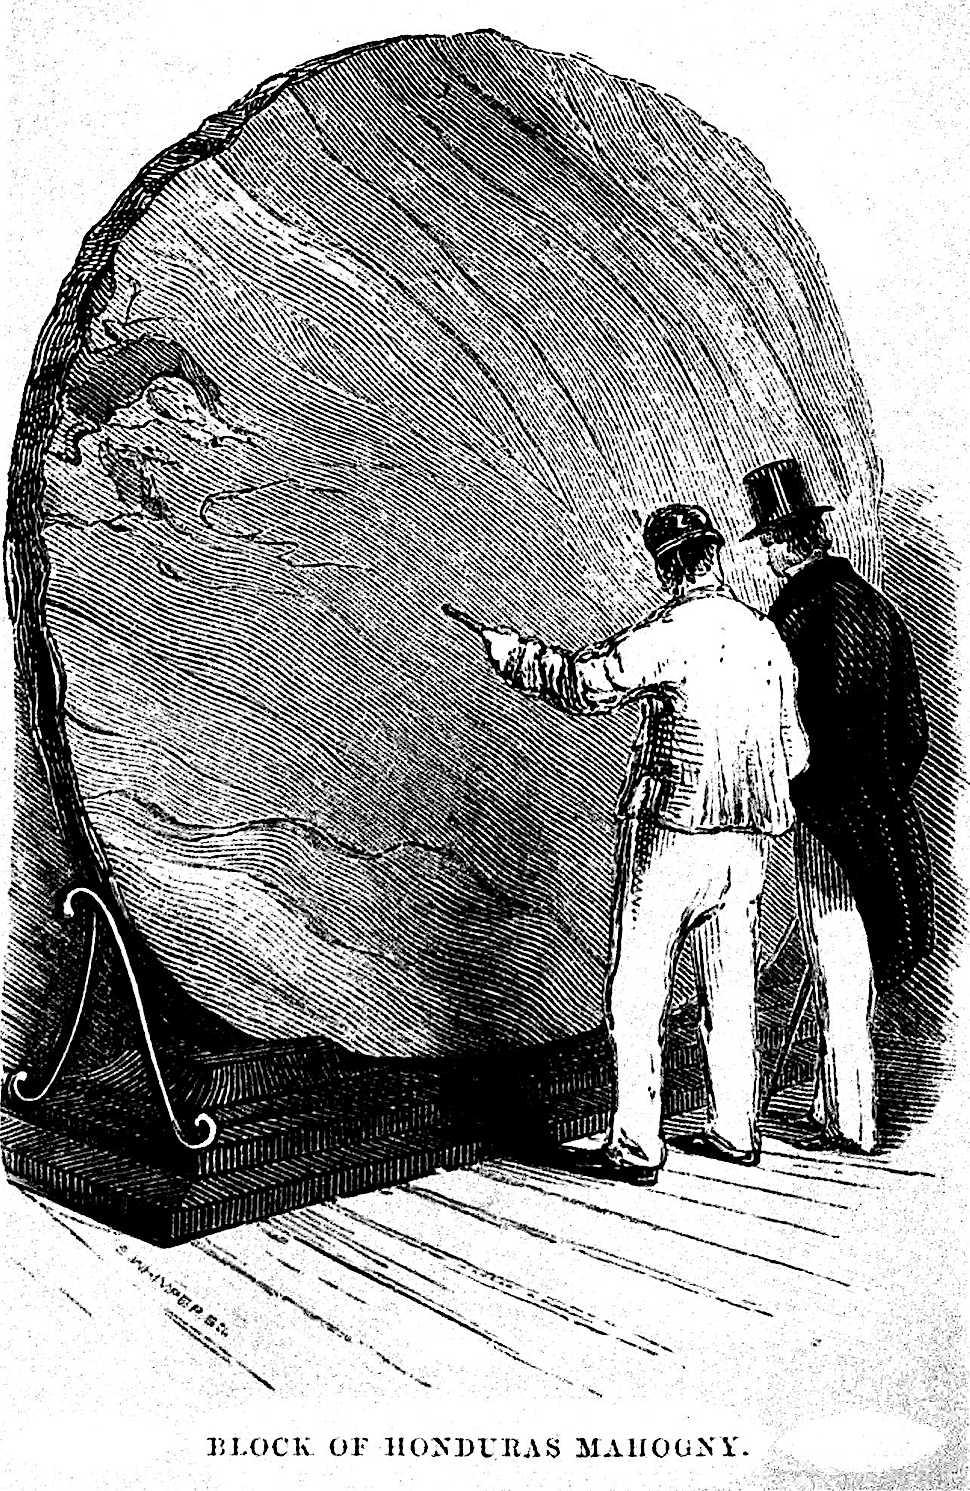 Block of Honduras Mahogany at the 1851 London Exhibition, an illustration